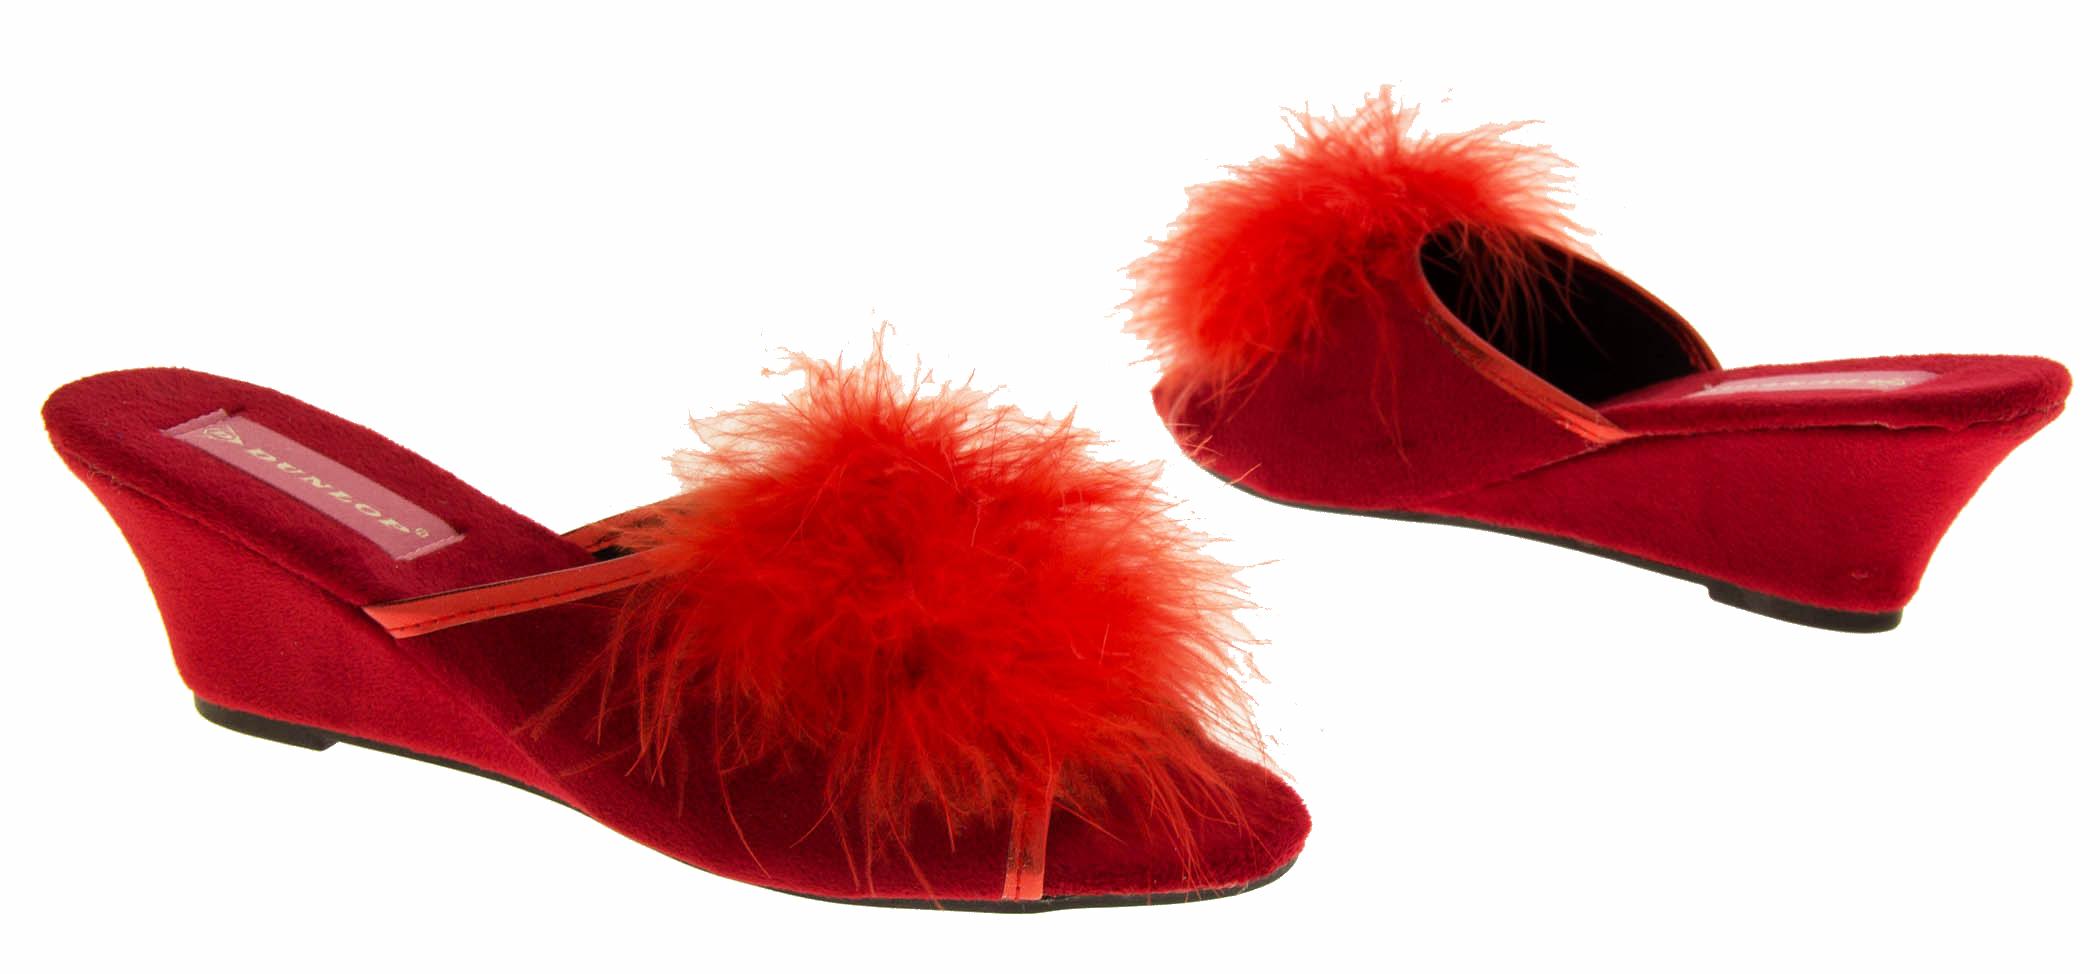 Womens Bedroom Slippers Womens Dunlop Slipper Wedges Heels Slip On Mules New